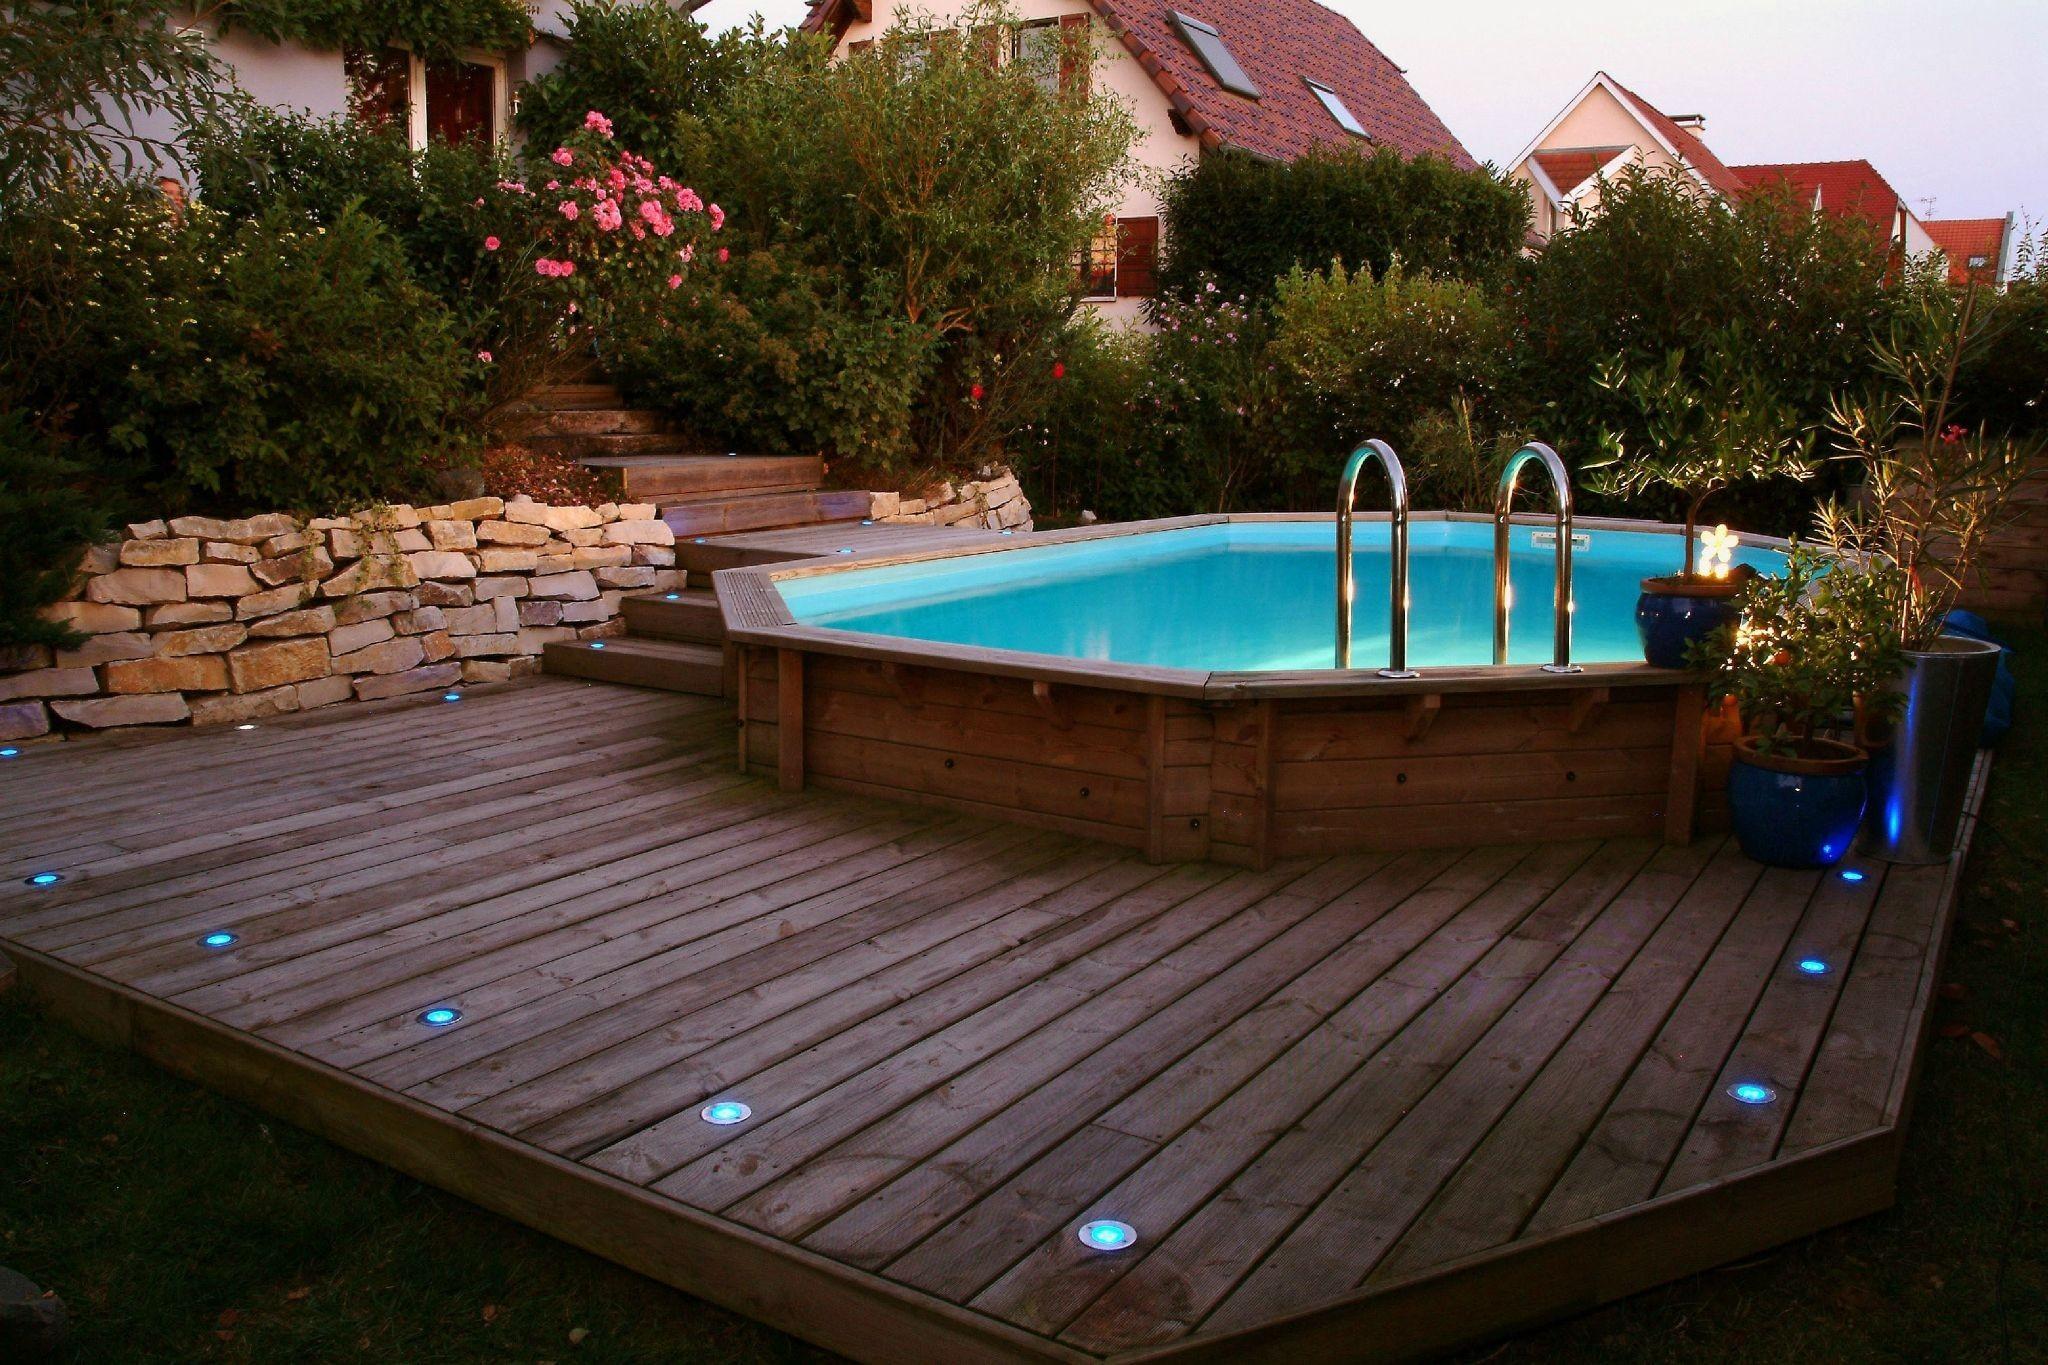 deco piscine exterieure hors sol